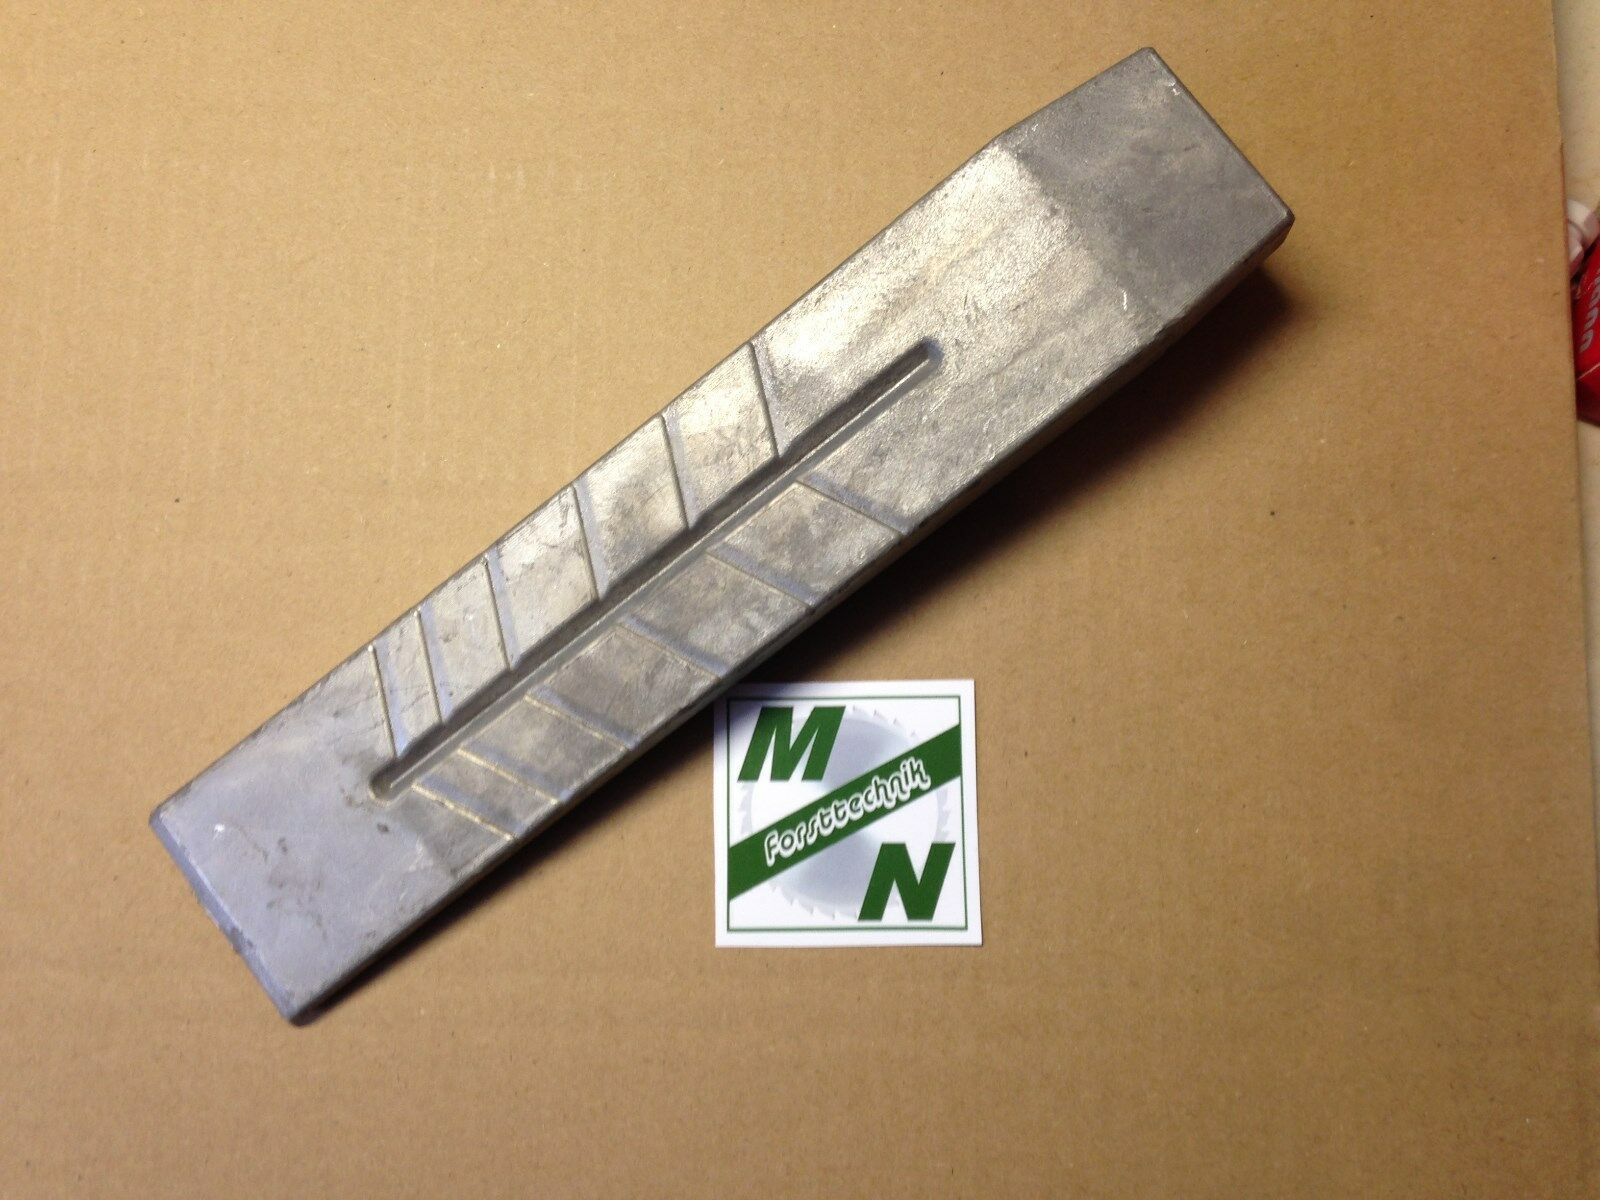 Alukeil Fällkeil Spaltkeil 800g Aluminium Keil 800g 260x55